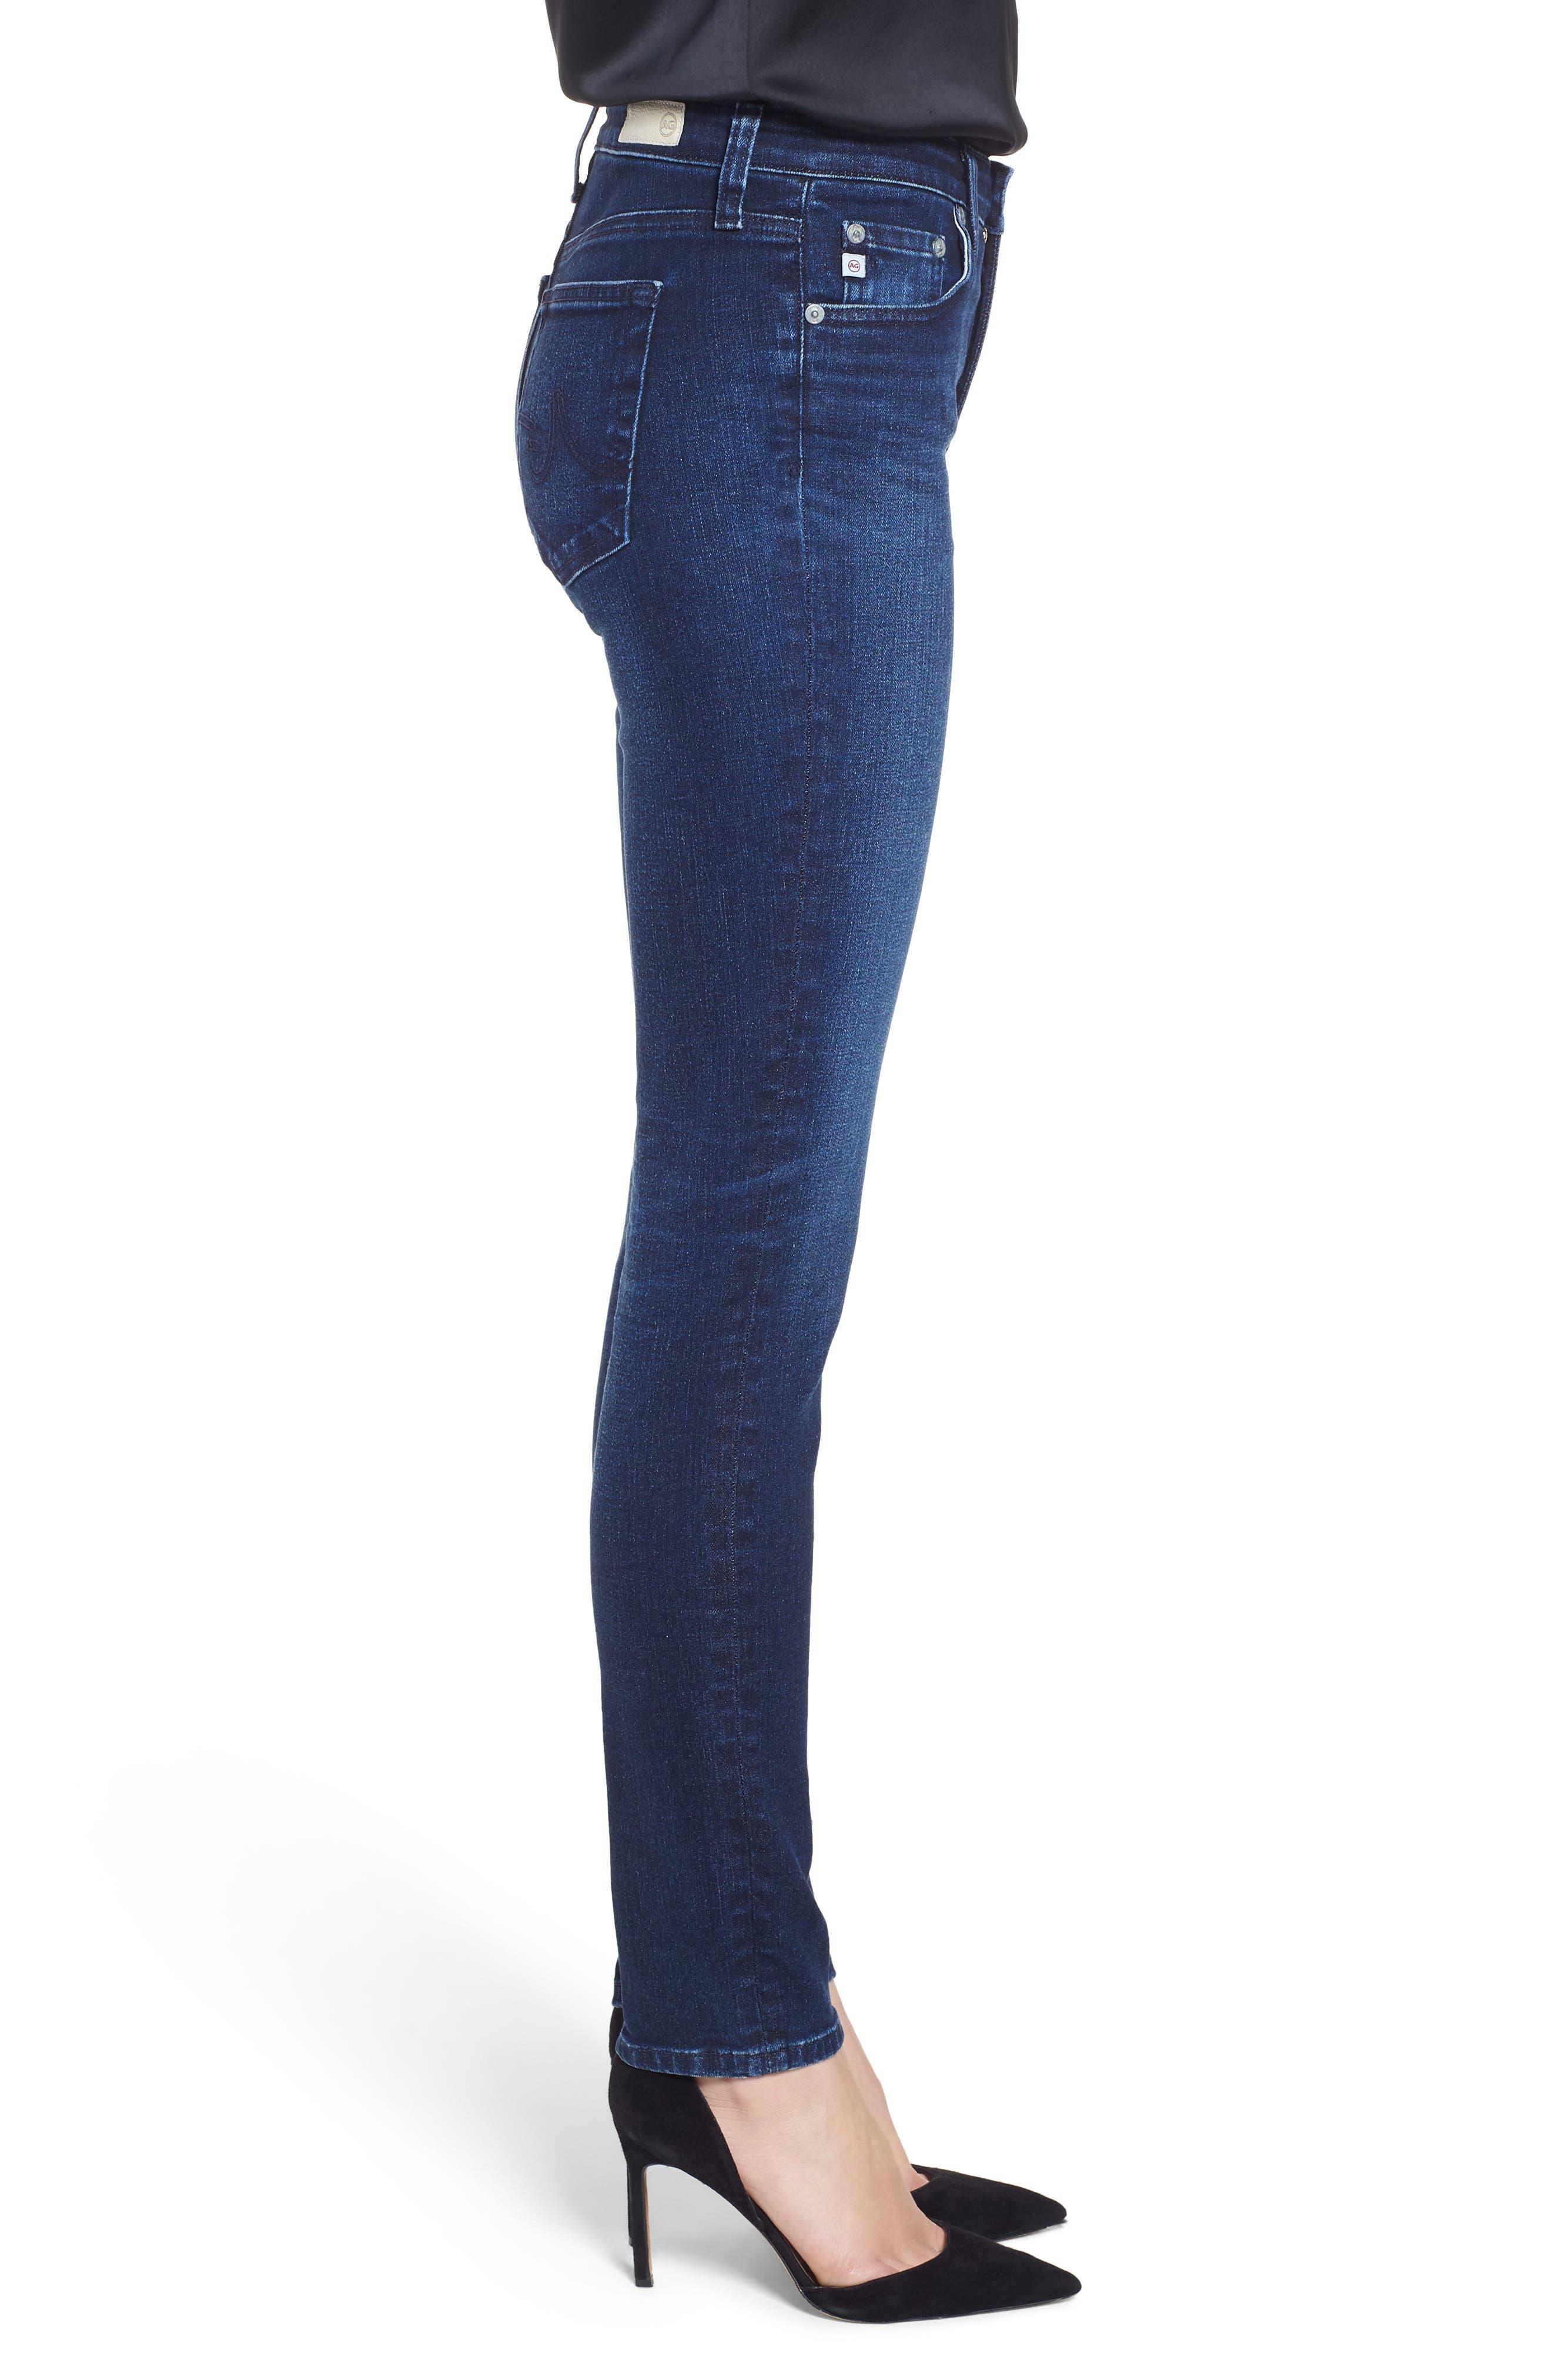 Prima Skinny Jeans,                             Alternate thumbnail 3, color,                             04 Years Celestial